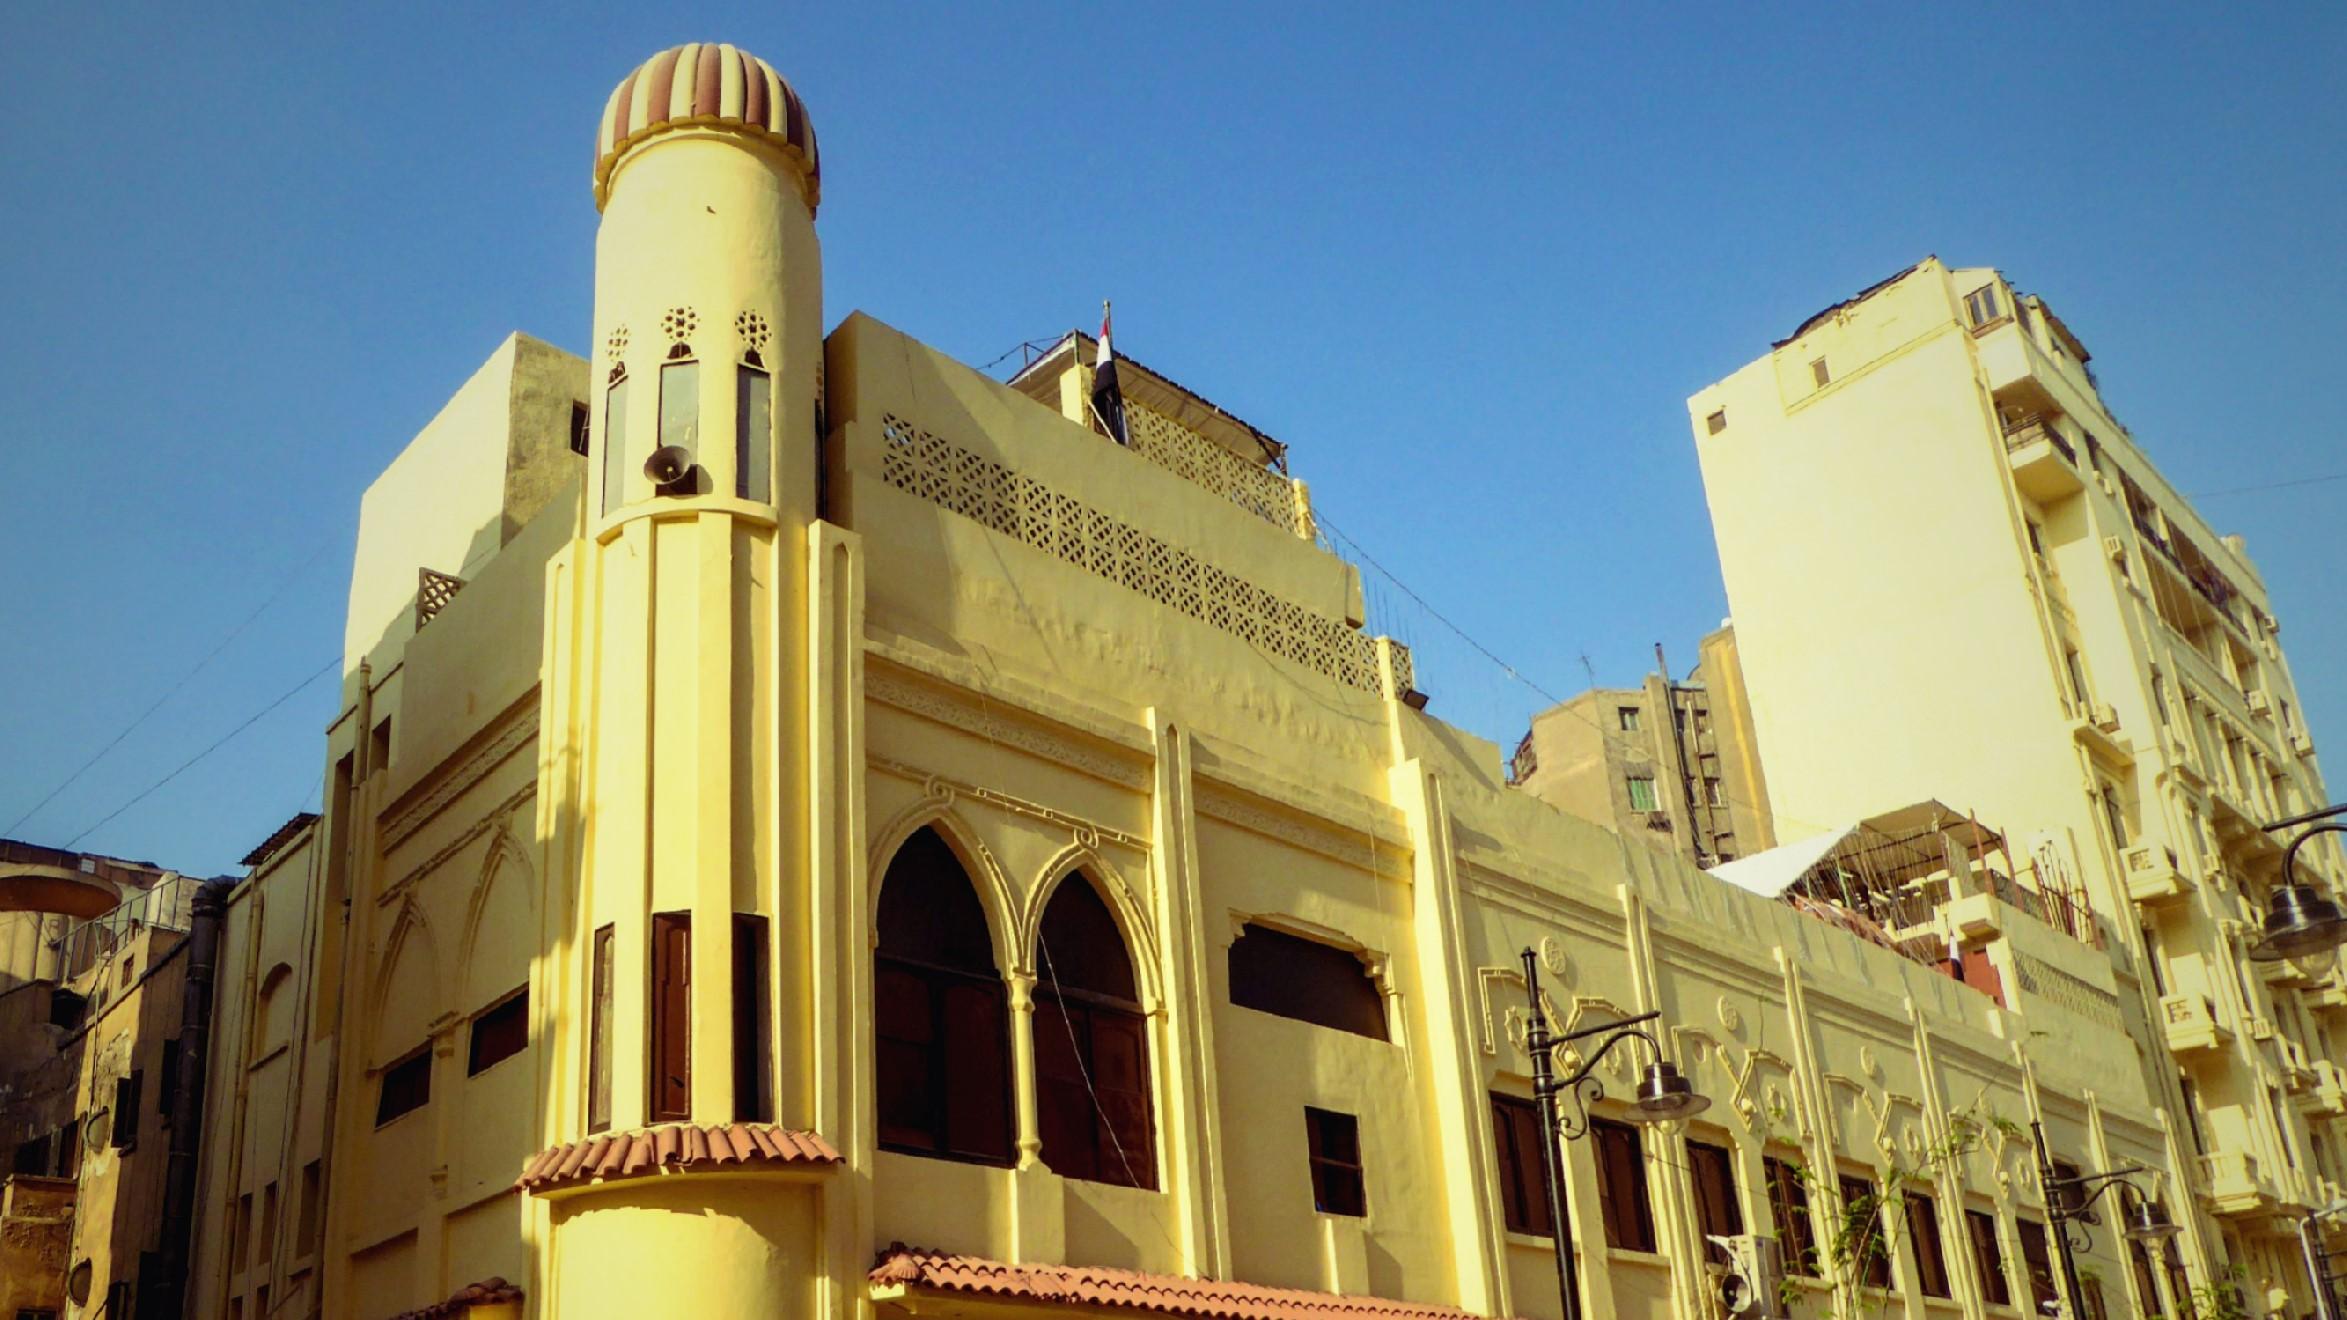 مطعم وكبابجي ألفي بك - تصوير: صديق البخشونجي